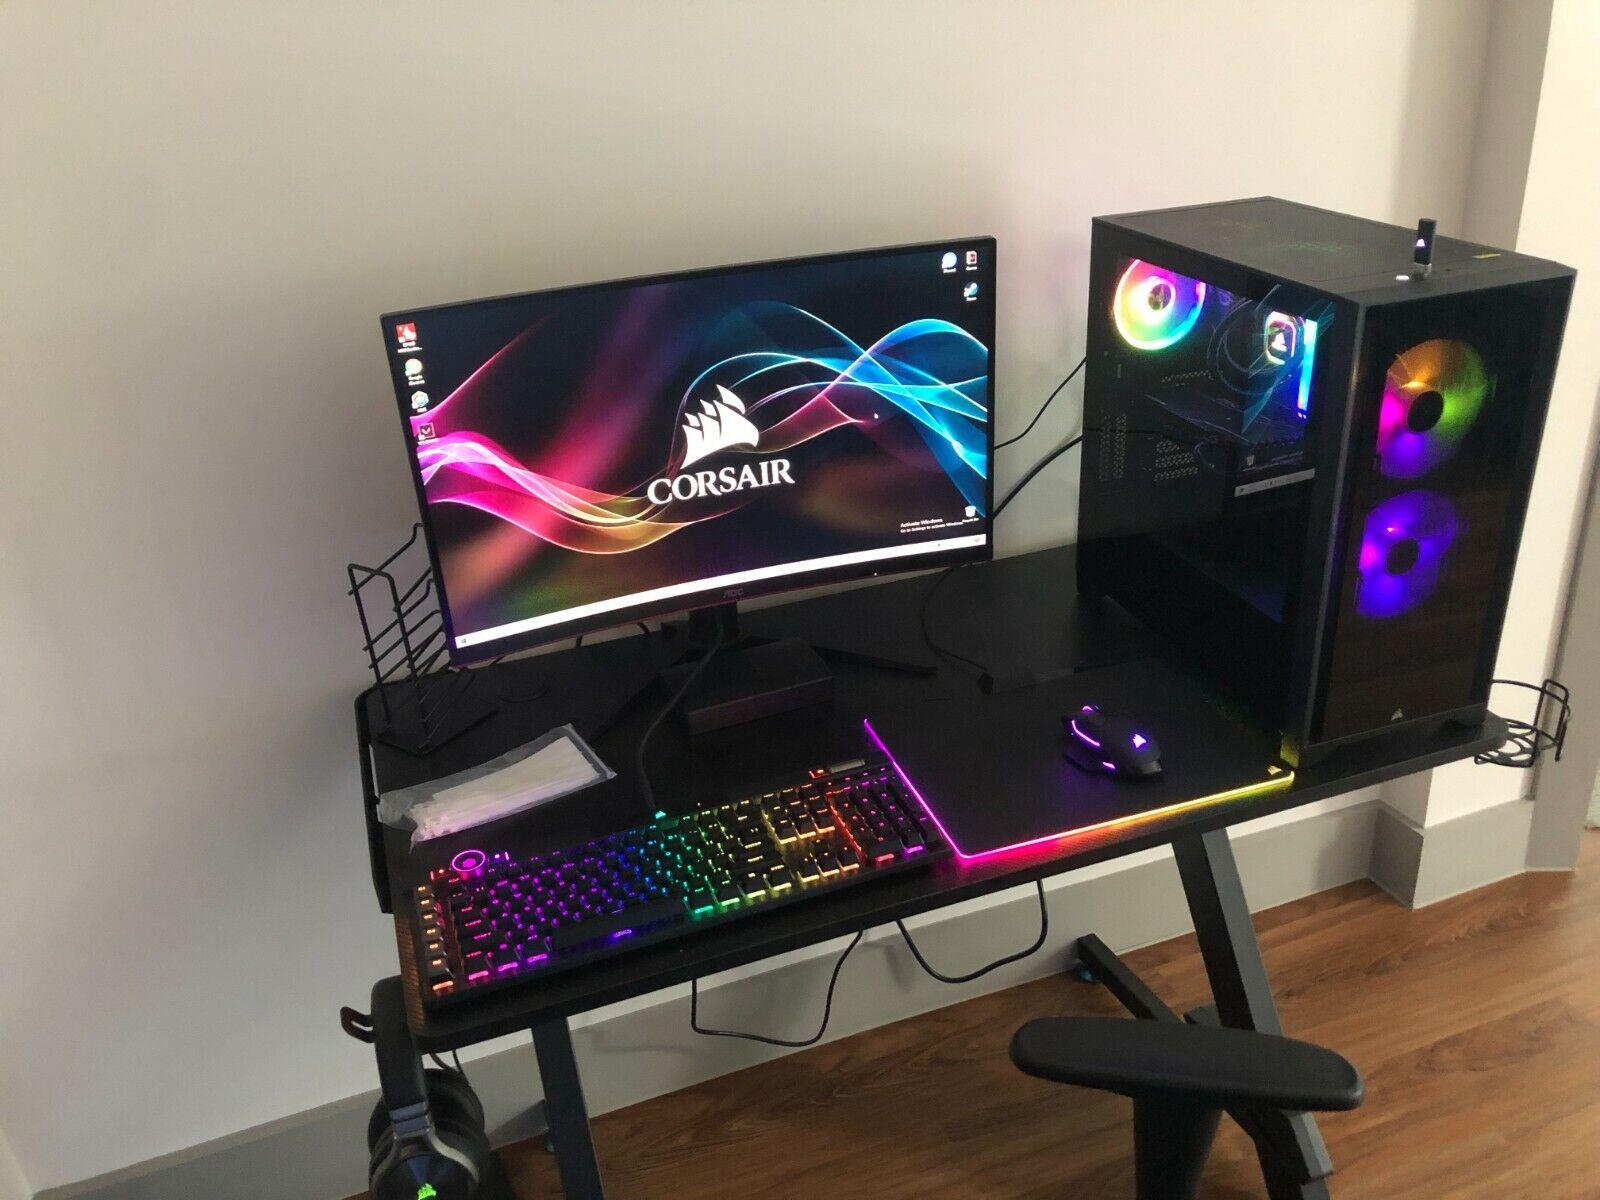 Corsair Gaming computer full setup